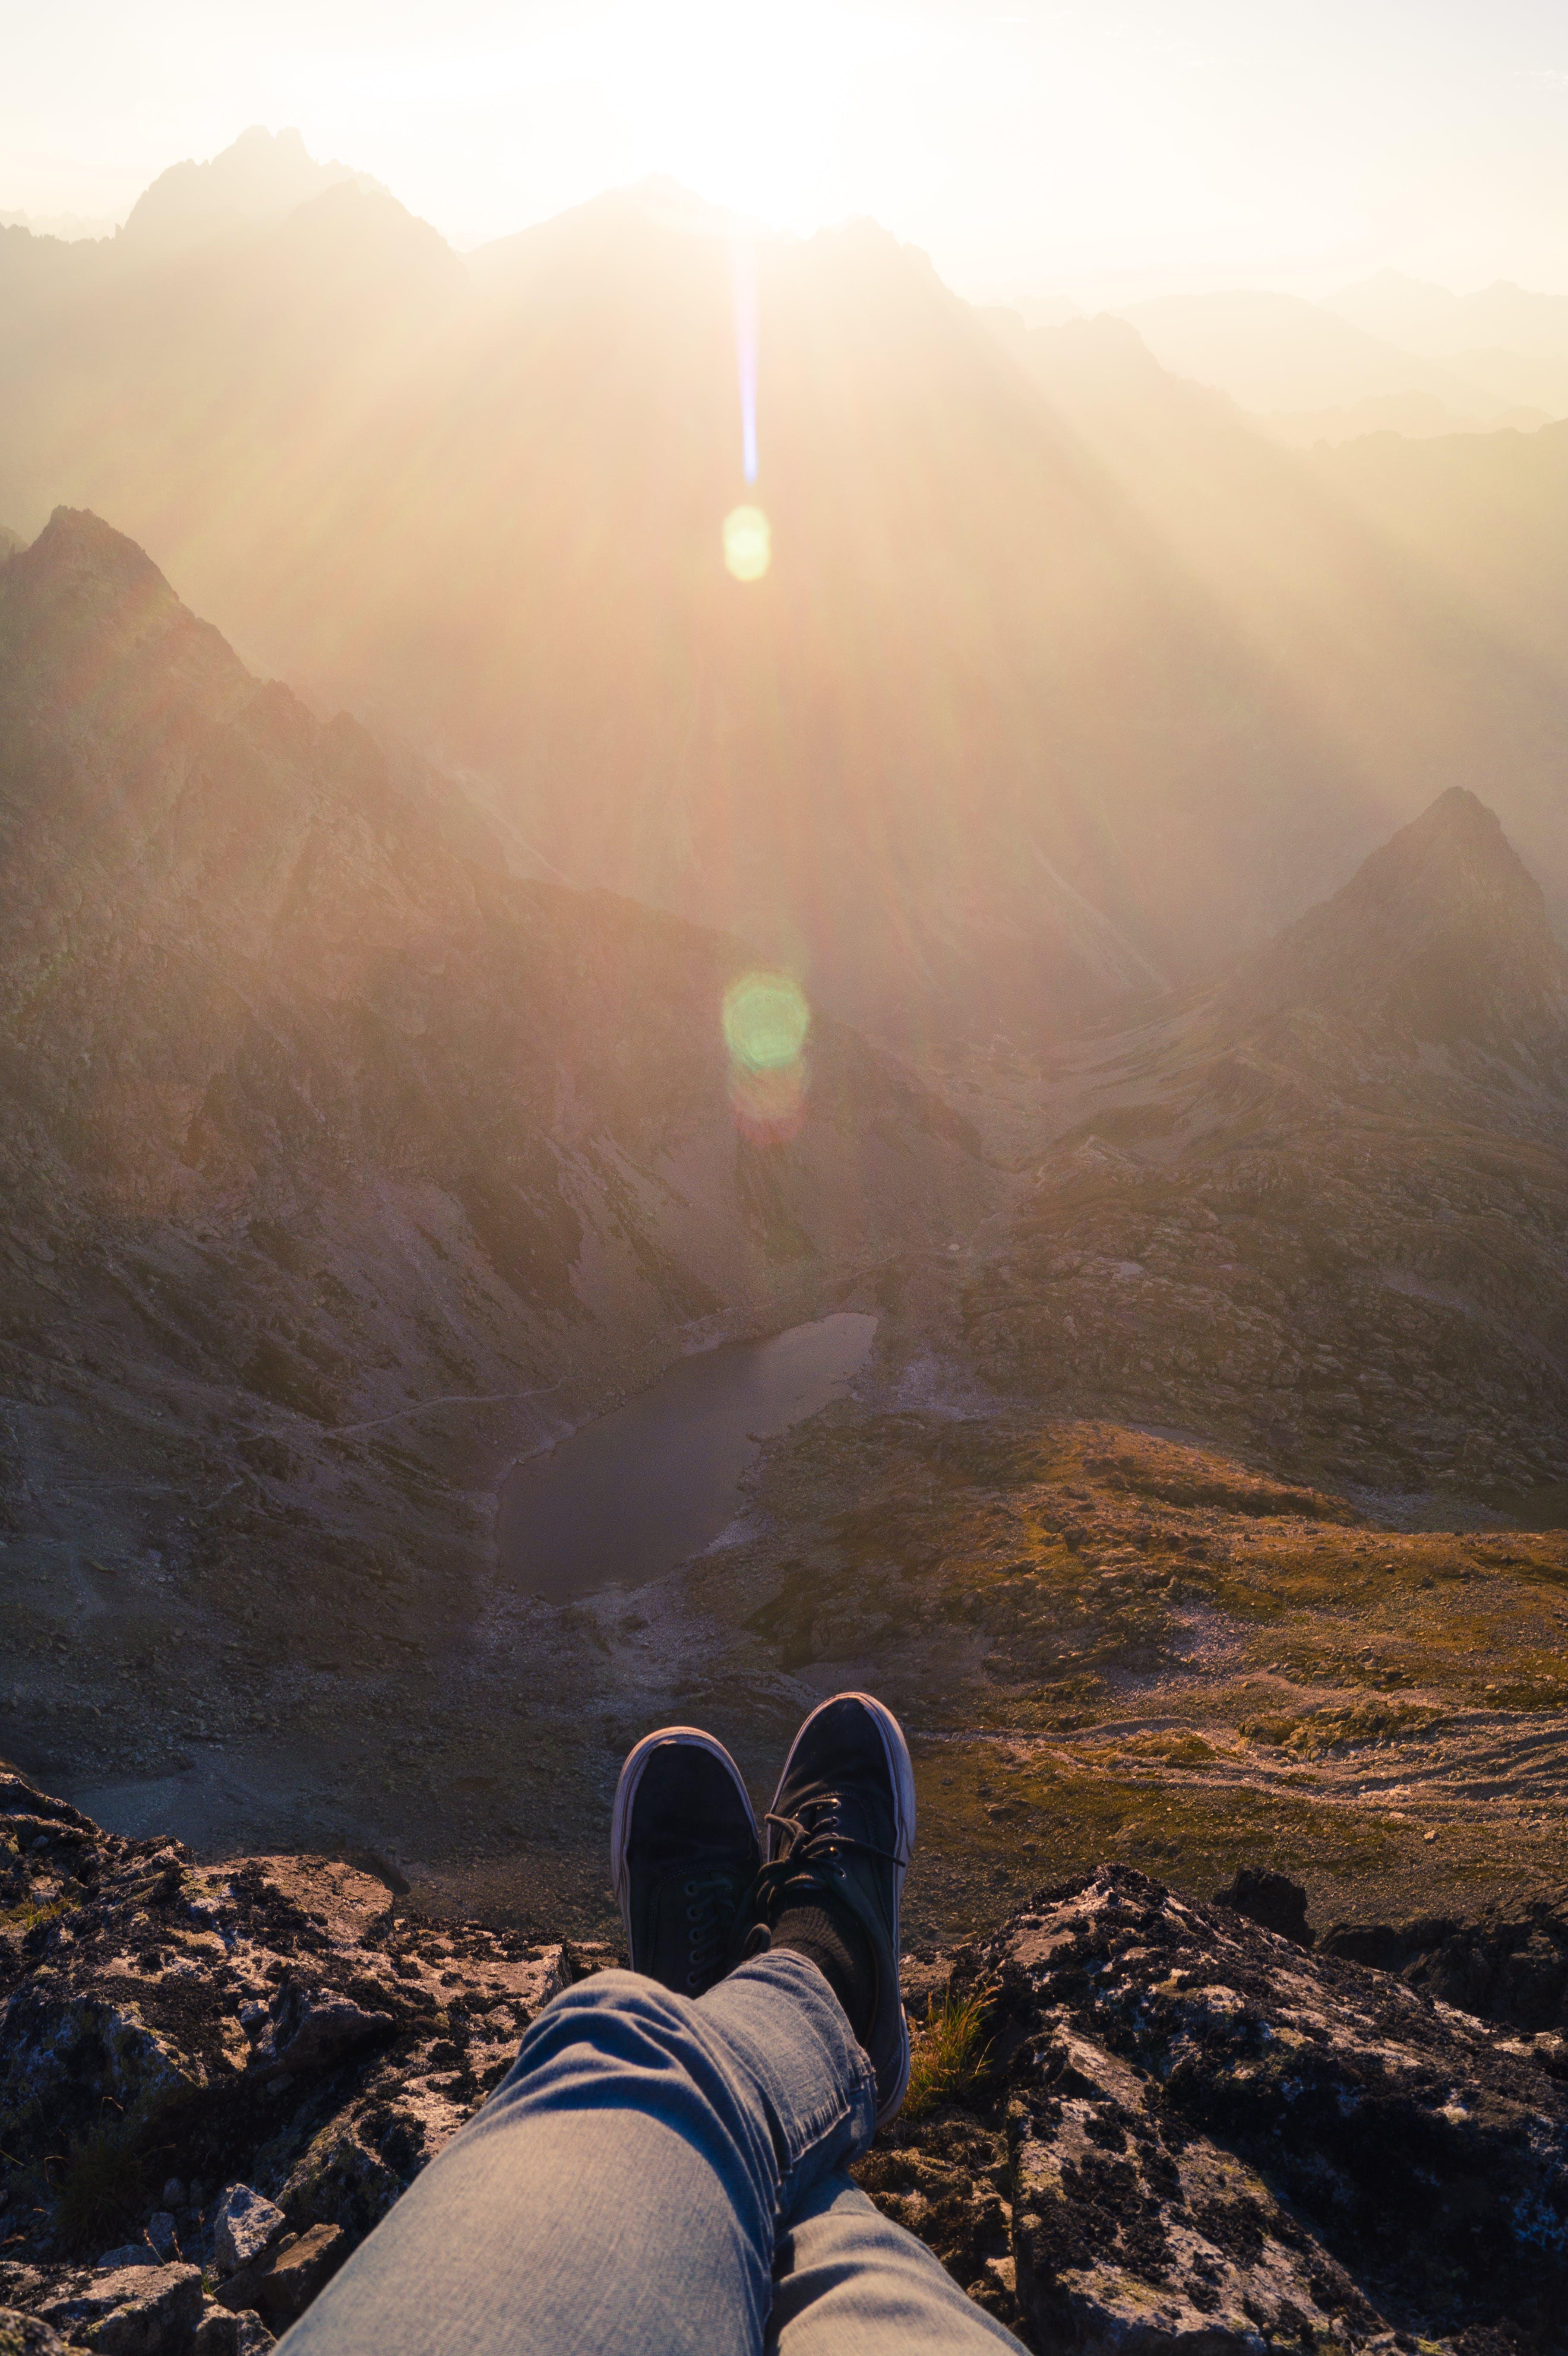 Kostenloses Stock Foto zu berge, sonnenuntergang, person, füße